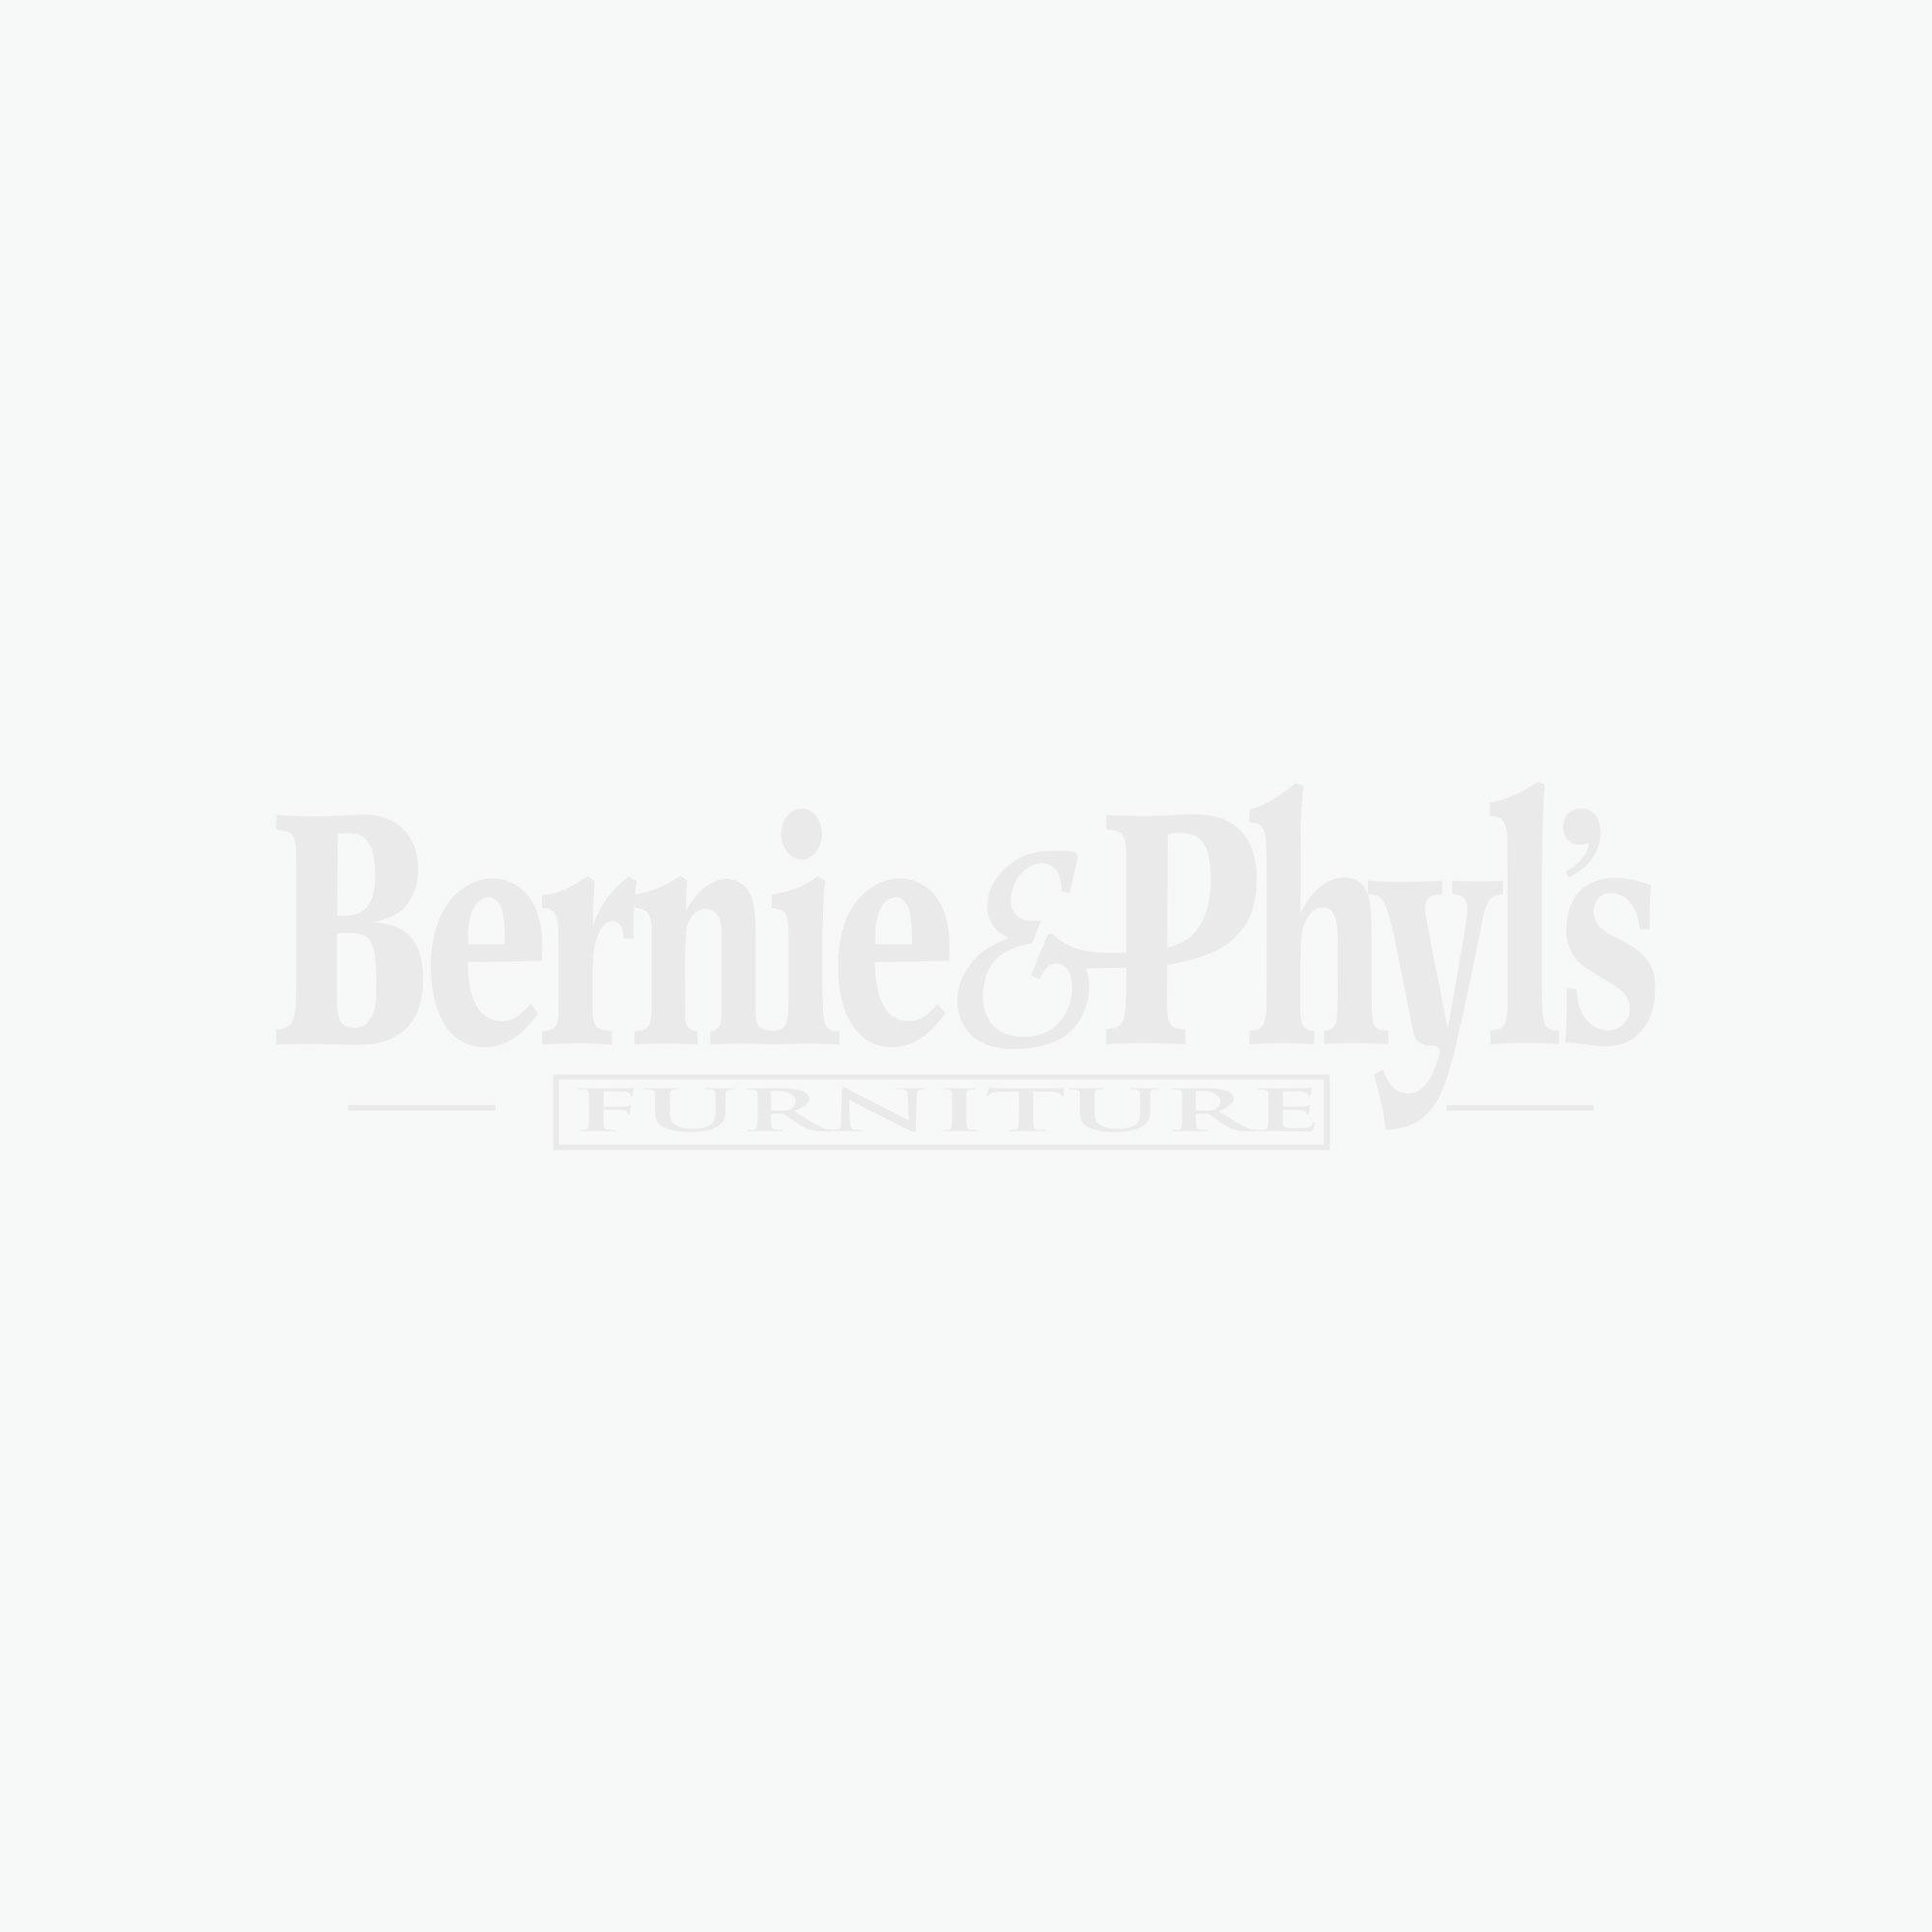 sienna sofa sleeper 46 deep leather moorland queen bernie and phyls furniture